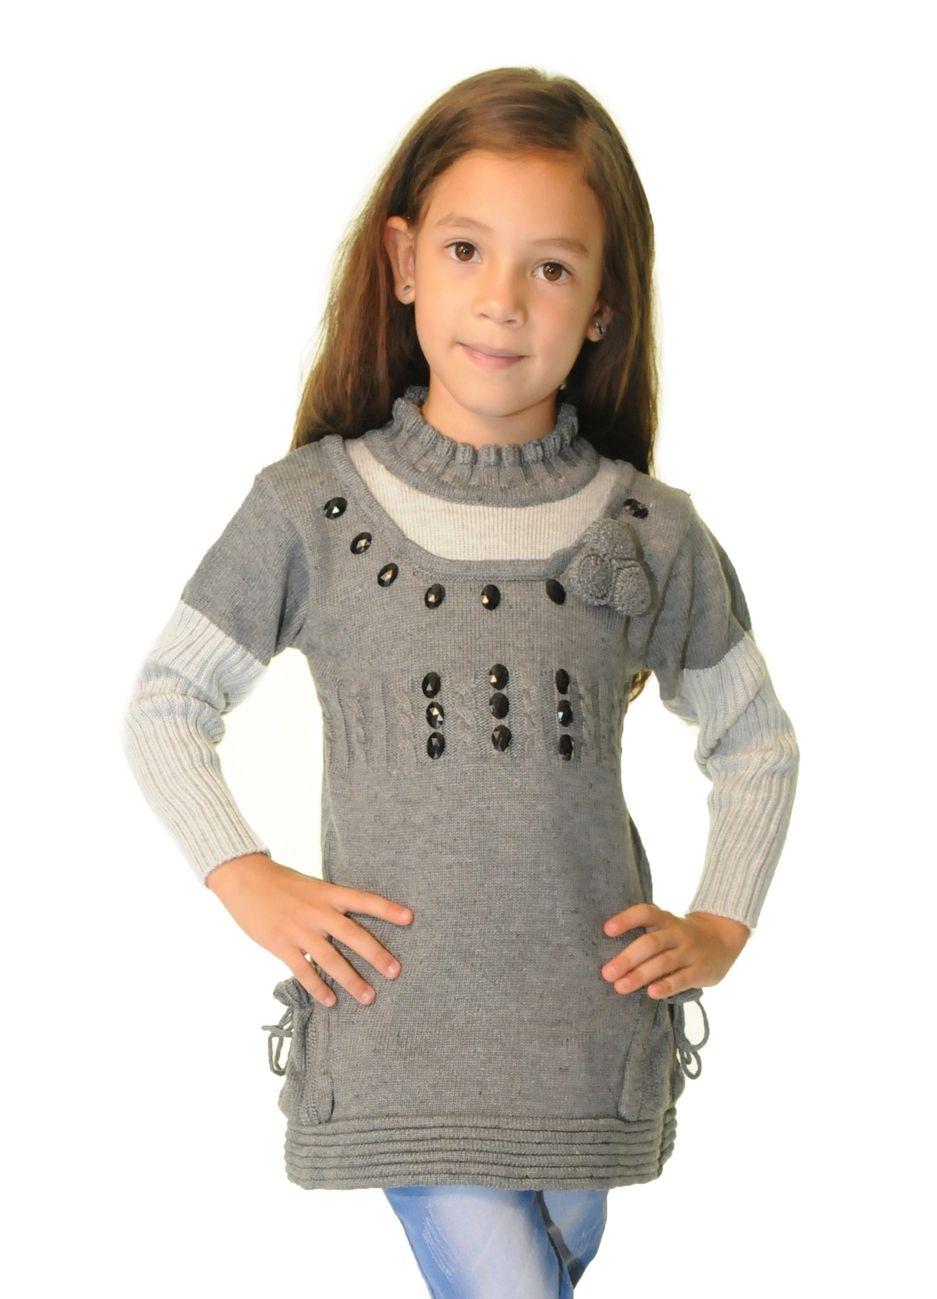 Modele Gratuit Tricot Robe Fille 6 Ans Modele Tricot